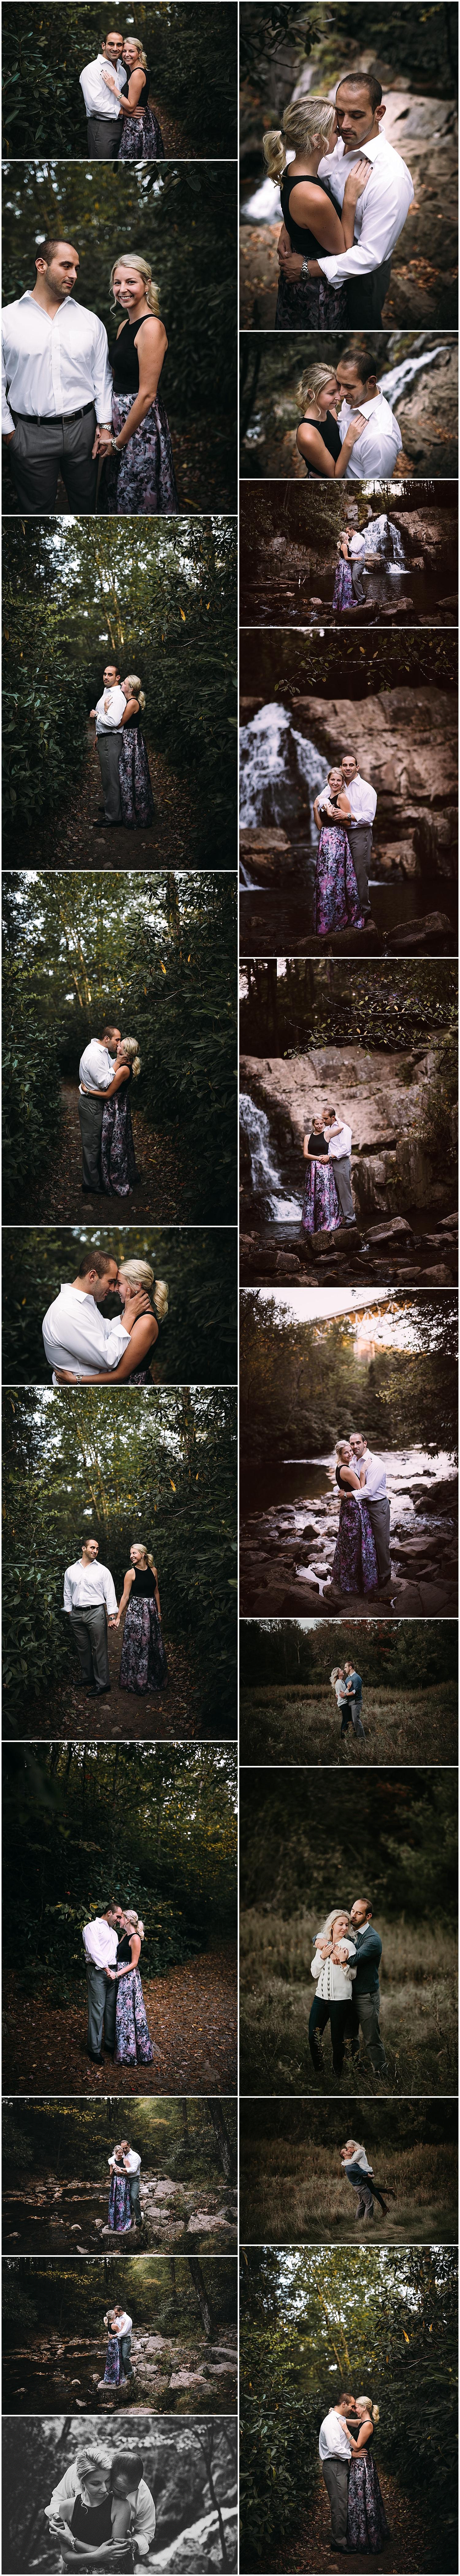 Central-PA-engagement-wedding-Photographer-in-wapwallopen-PA-NEPA_0266.jpg